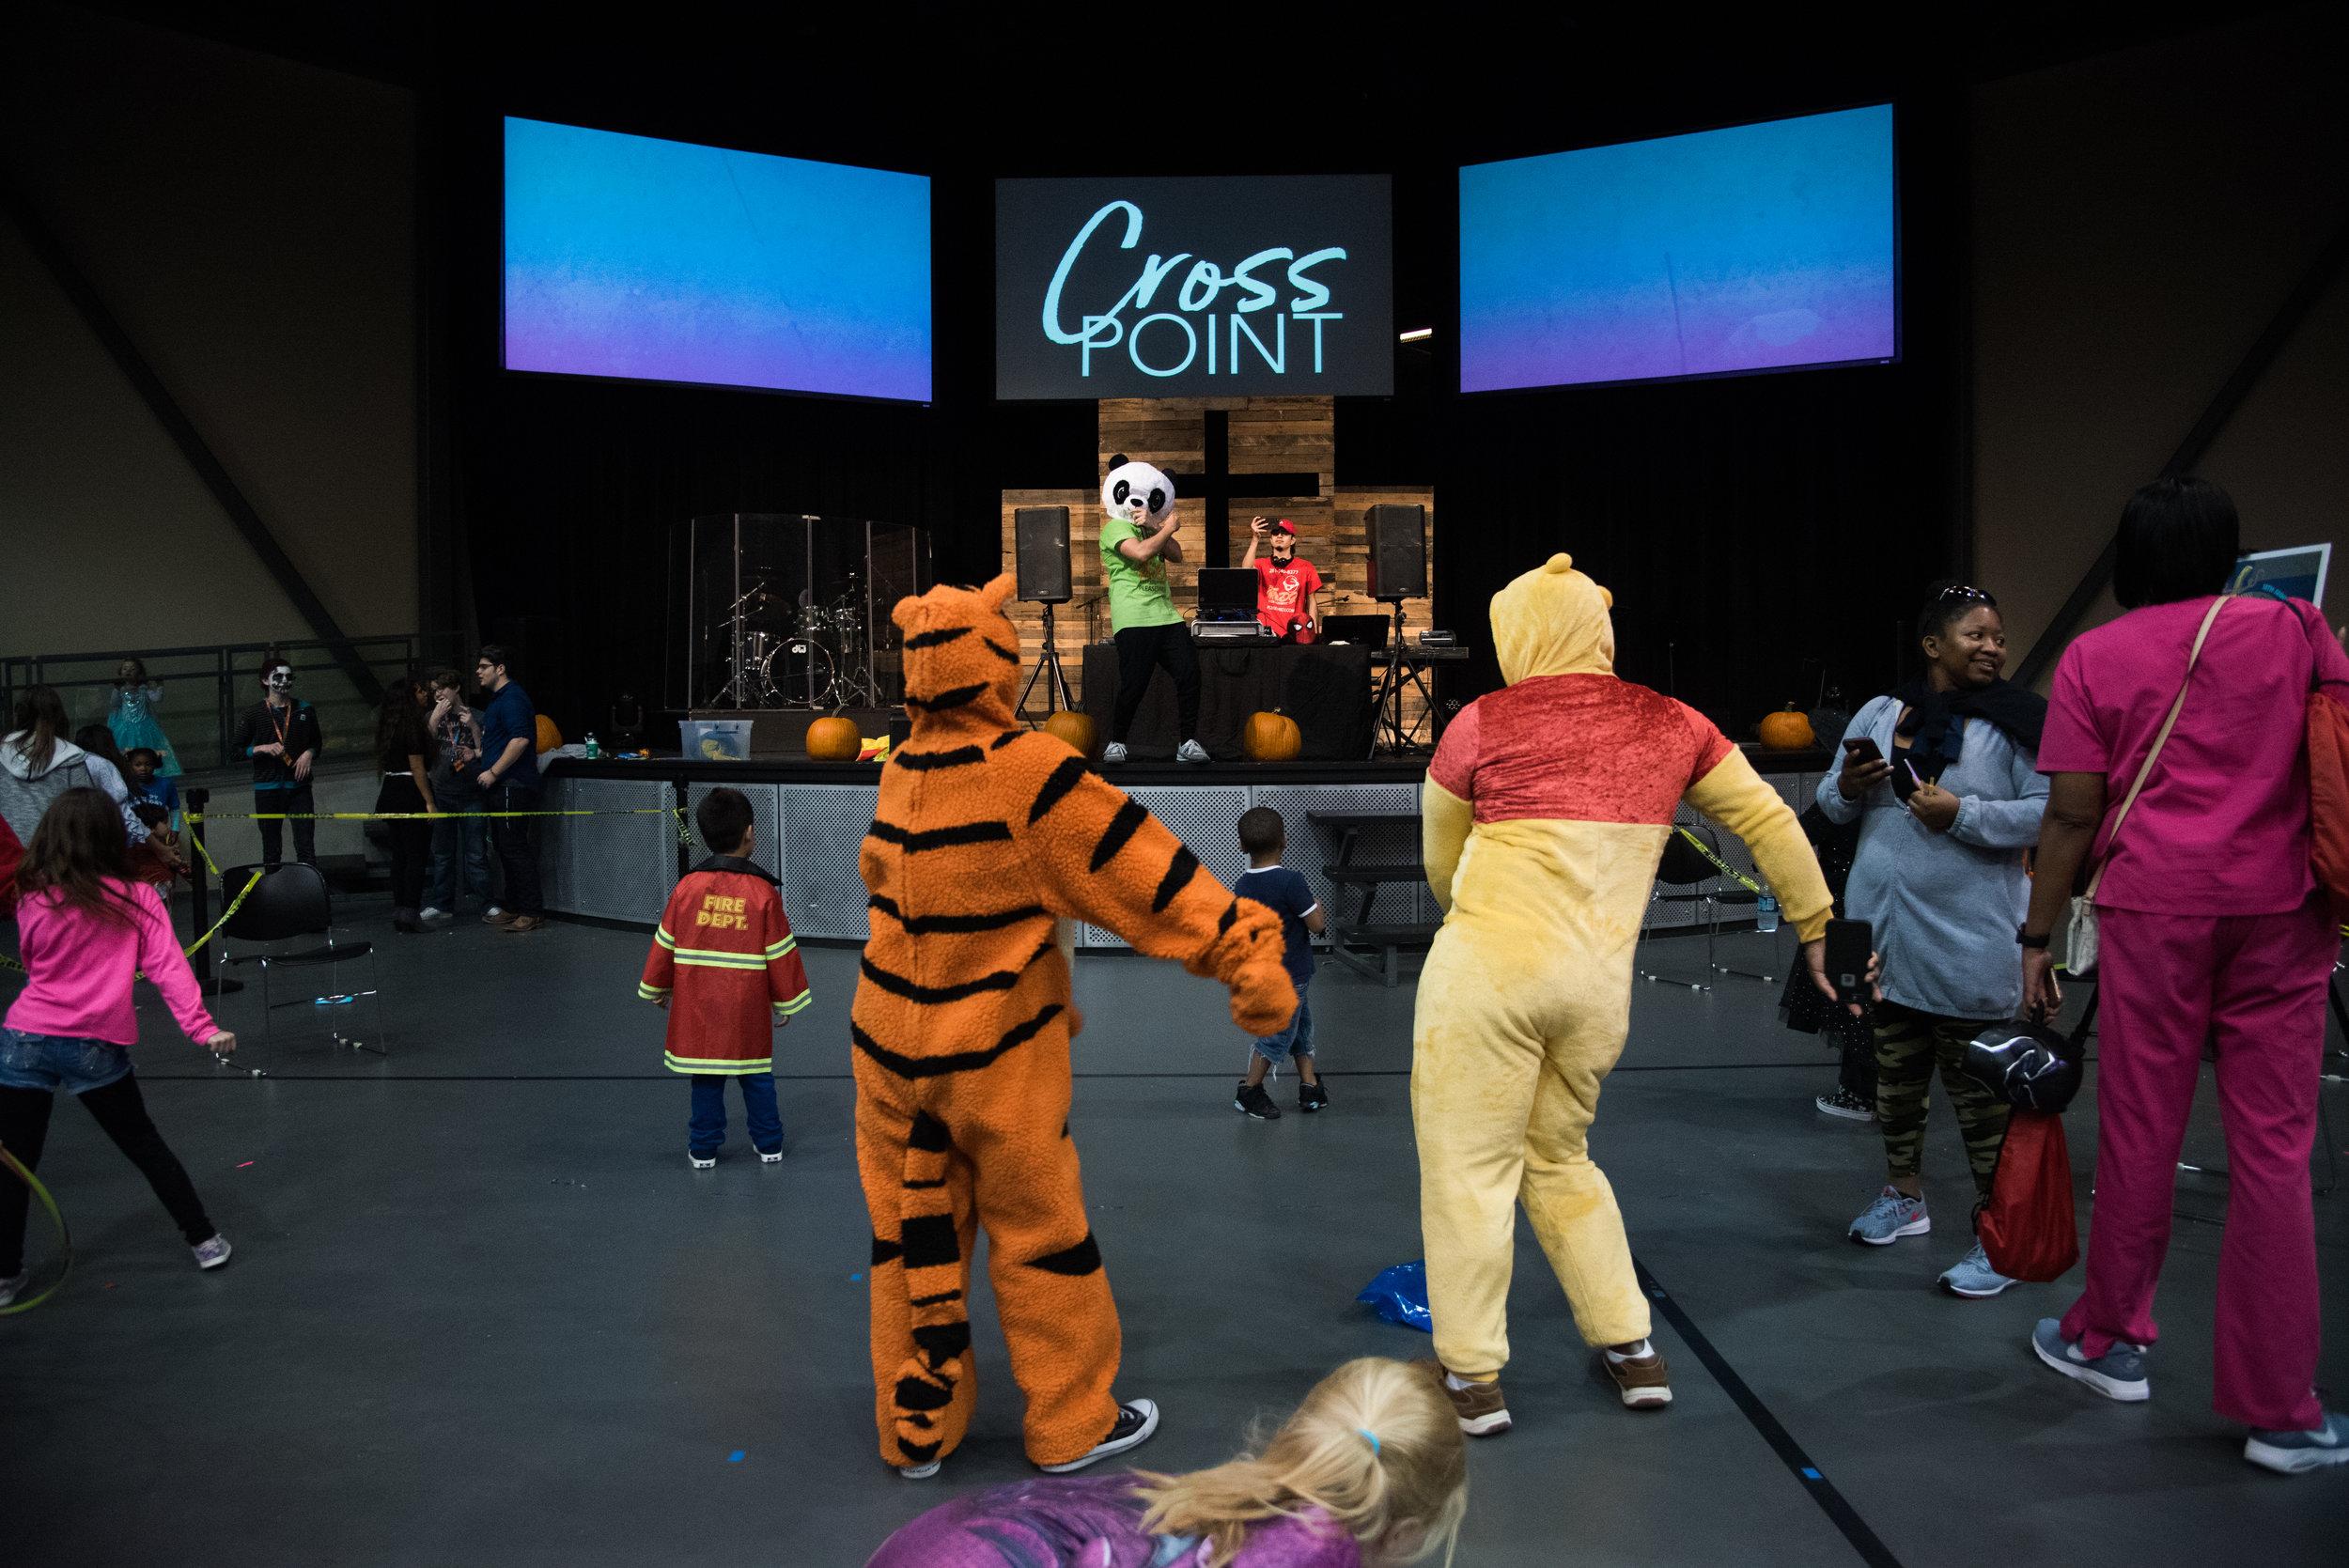 CrossPoint-Katy-church-event-Fall-fest-2018-O-135.jpg